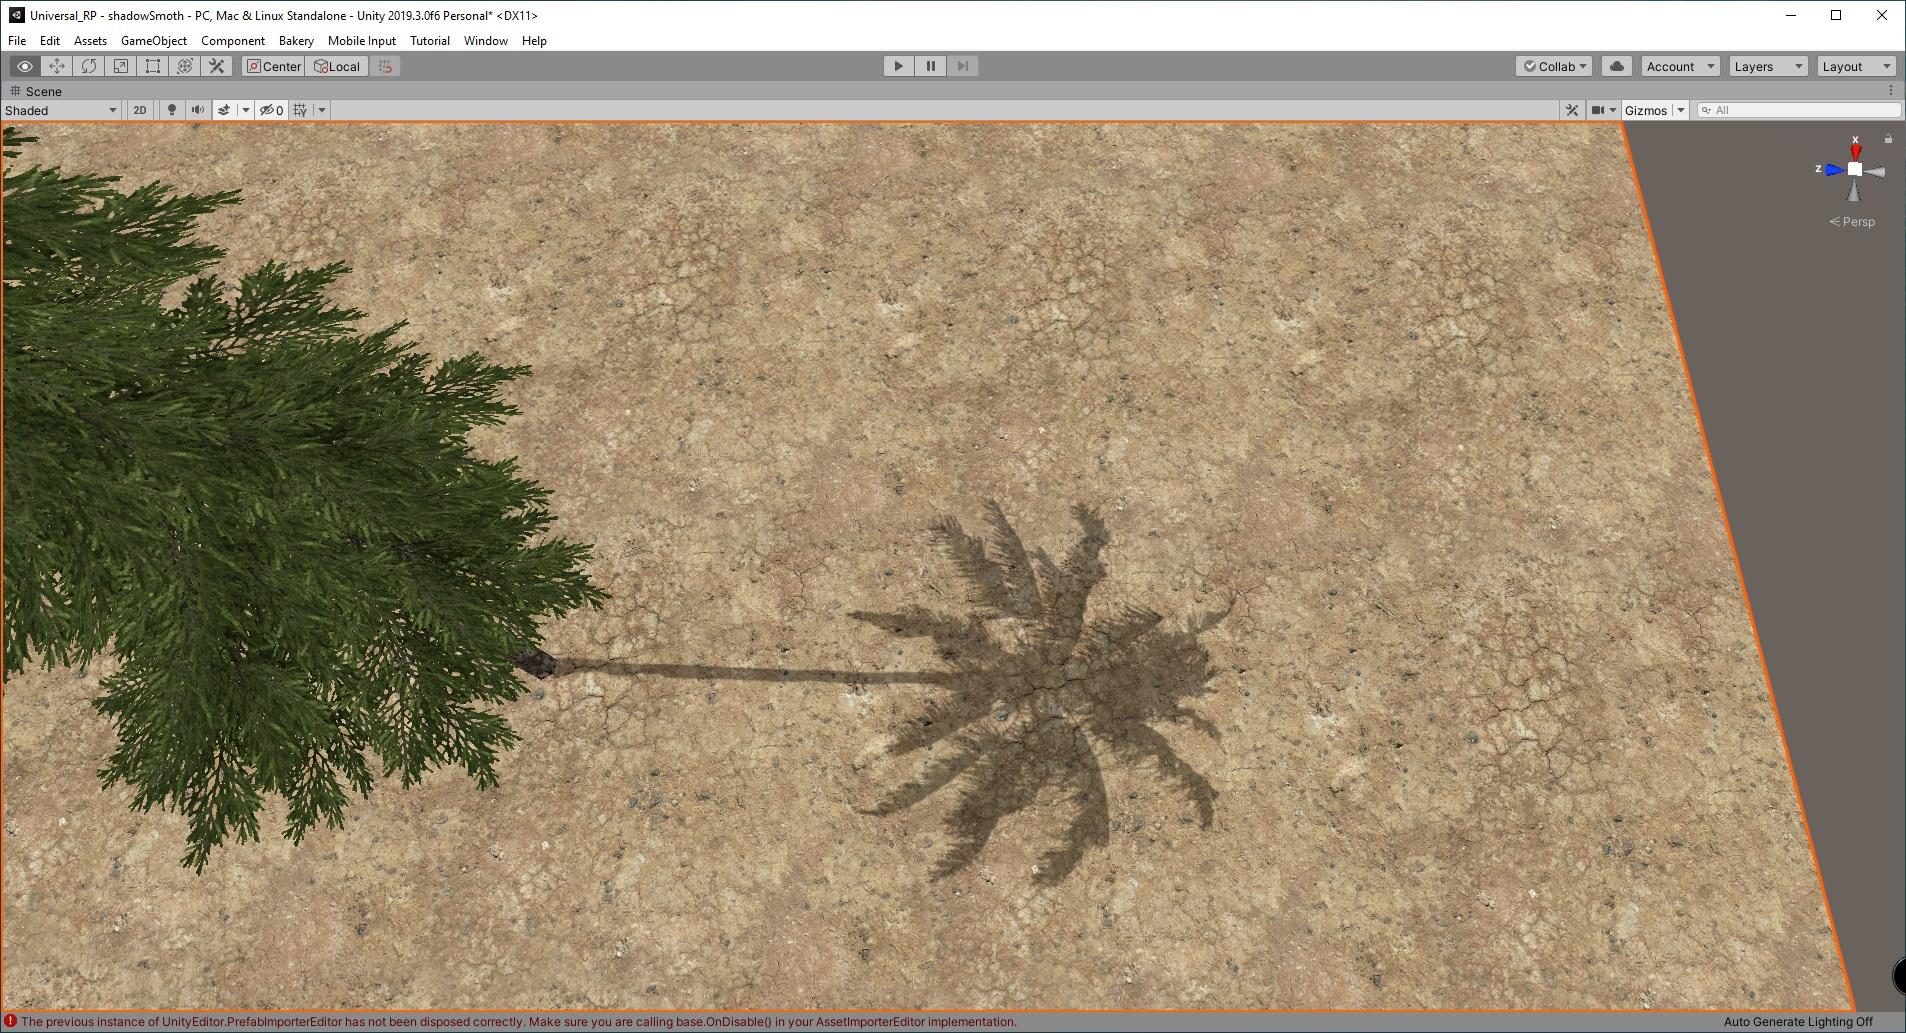 shadowSprite.jpg